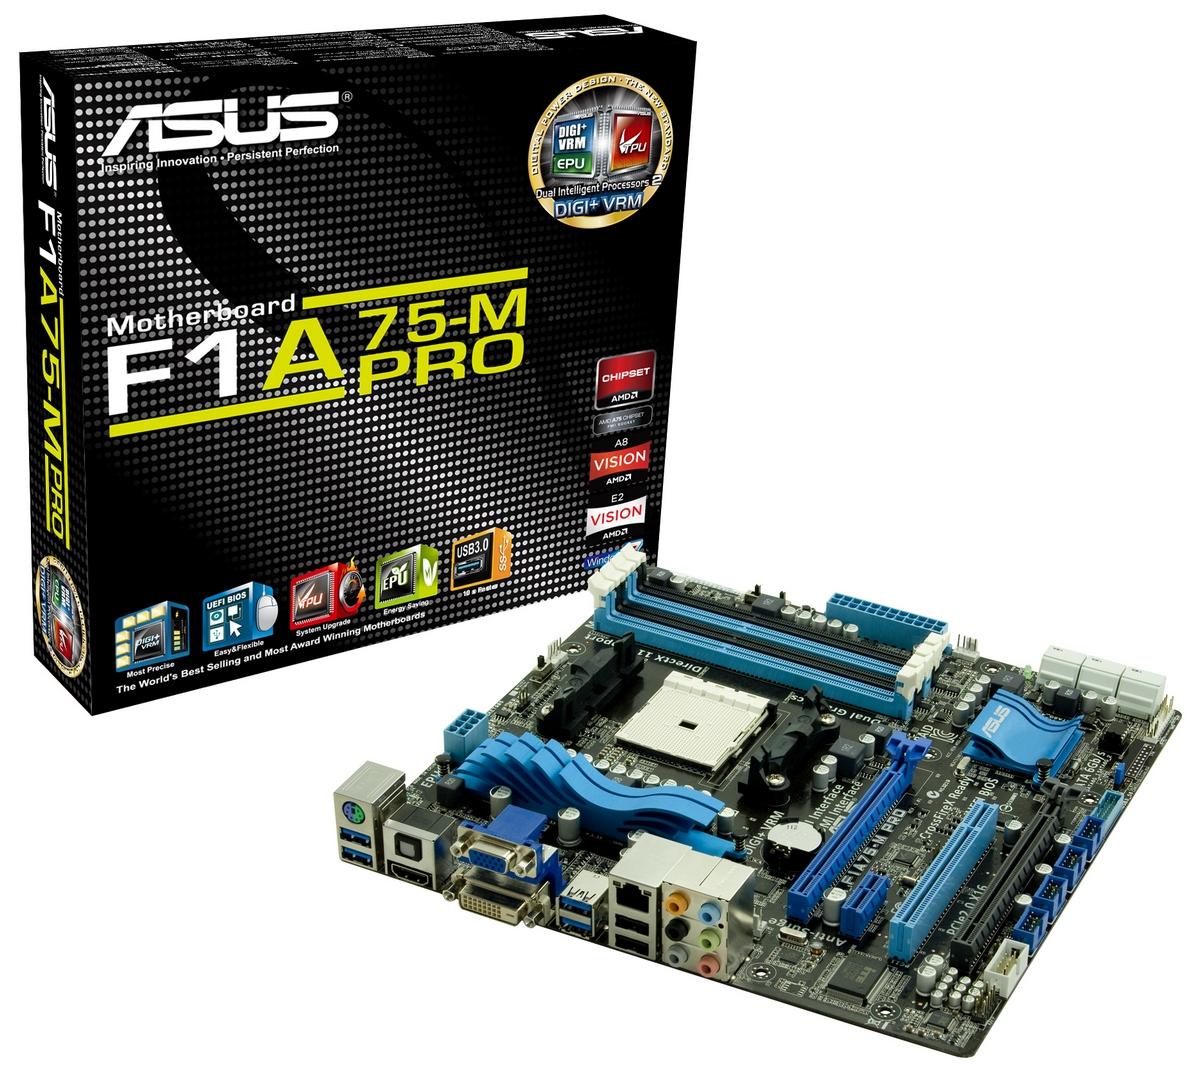 Final Words - ASUS F1A75-M Pro Review - Micro-ATX Llano at $110